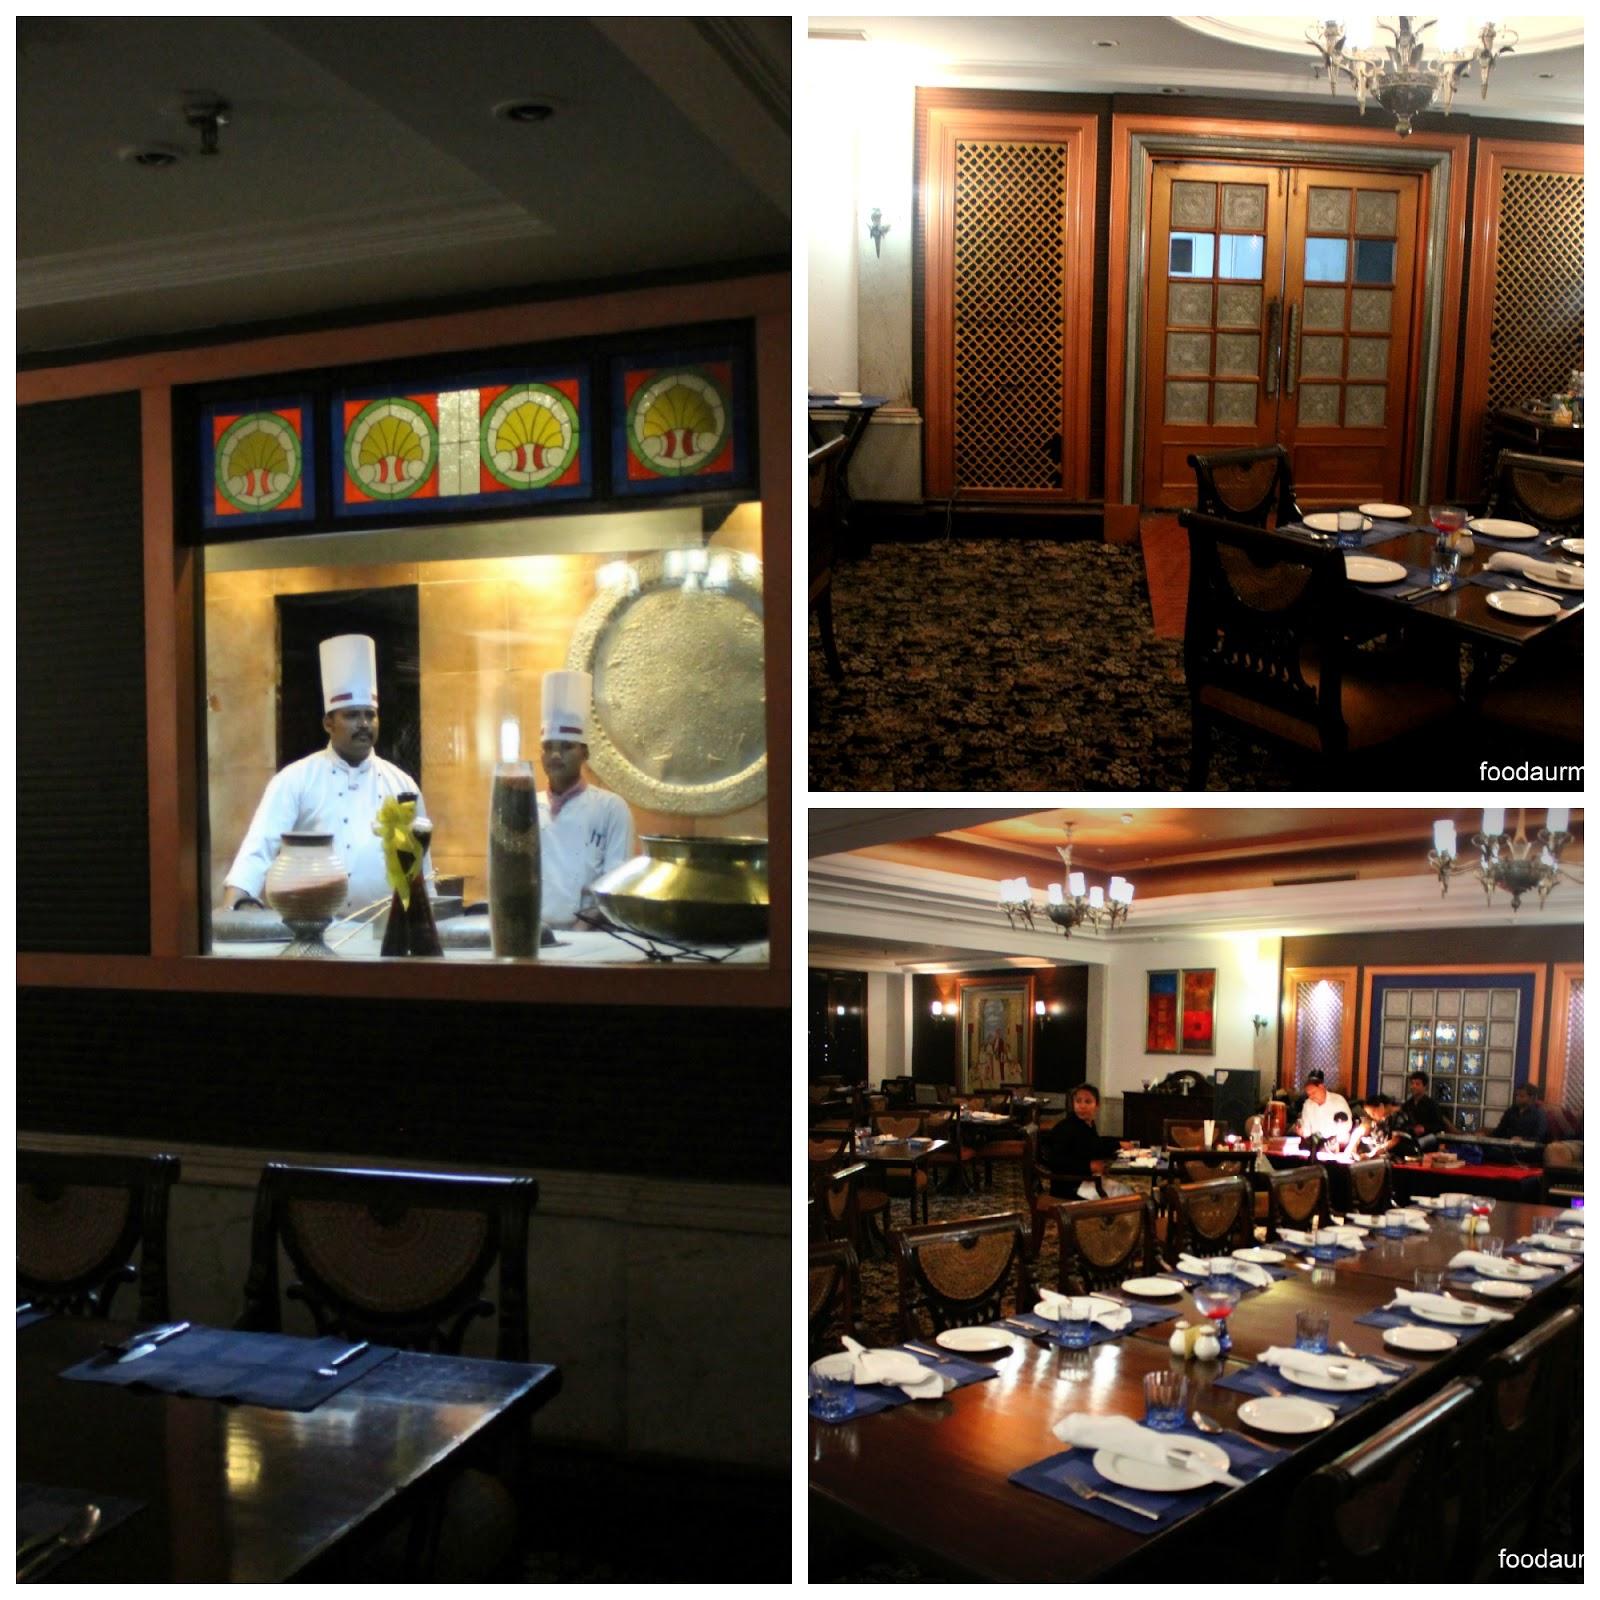 The Luscious Mughlai,Lucknowi food @ zaffran The Bristol Hotel, Gurgaon